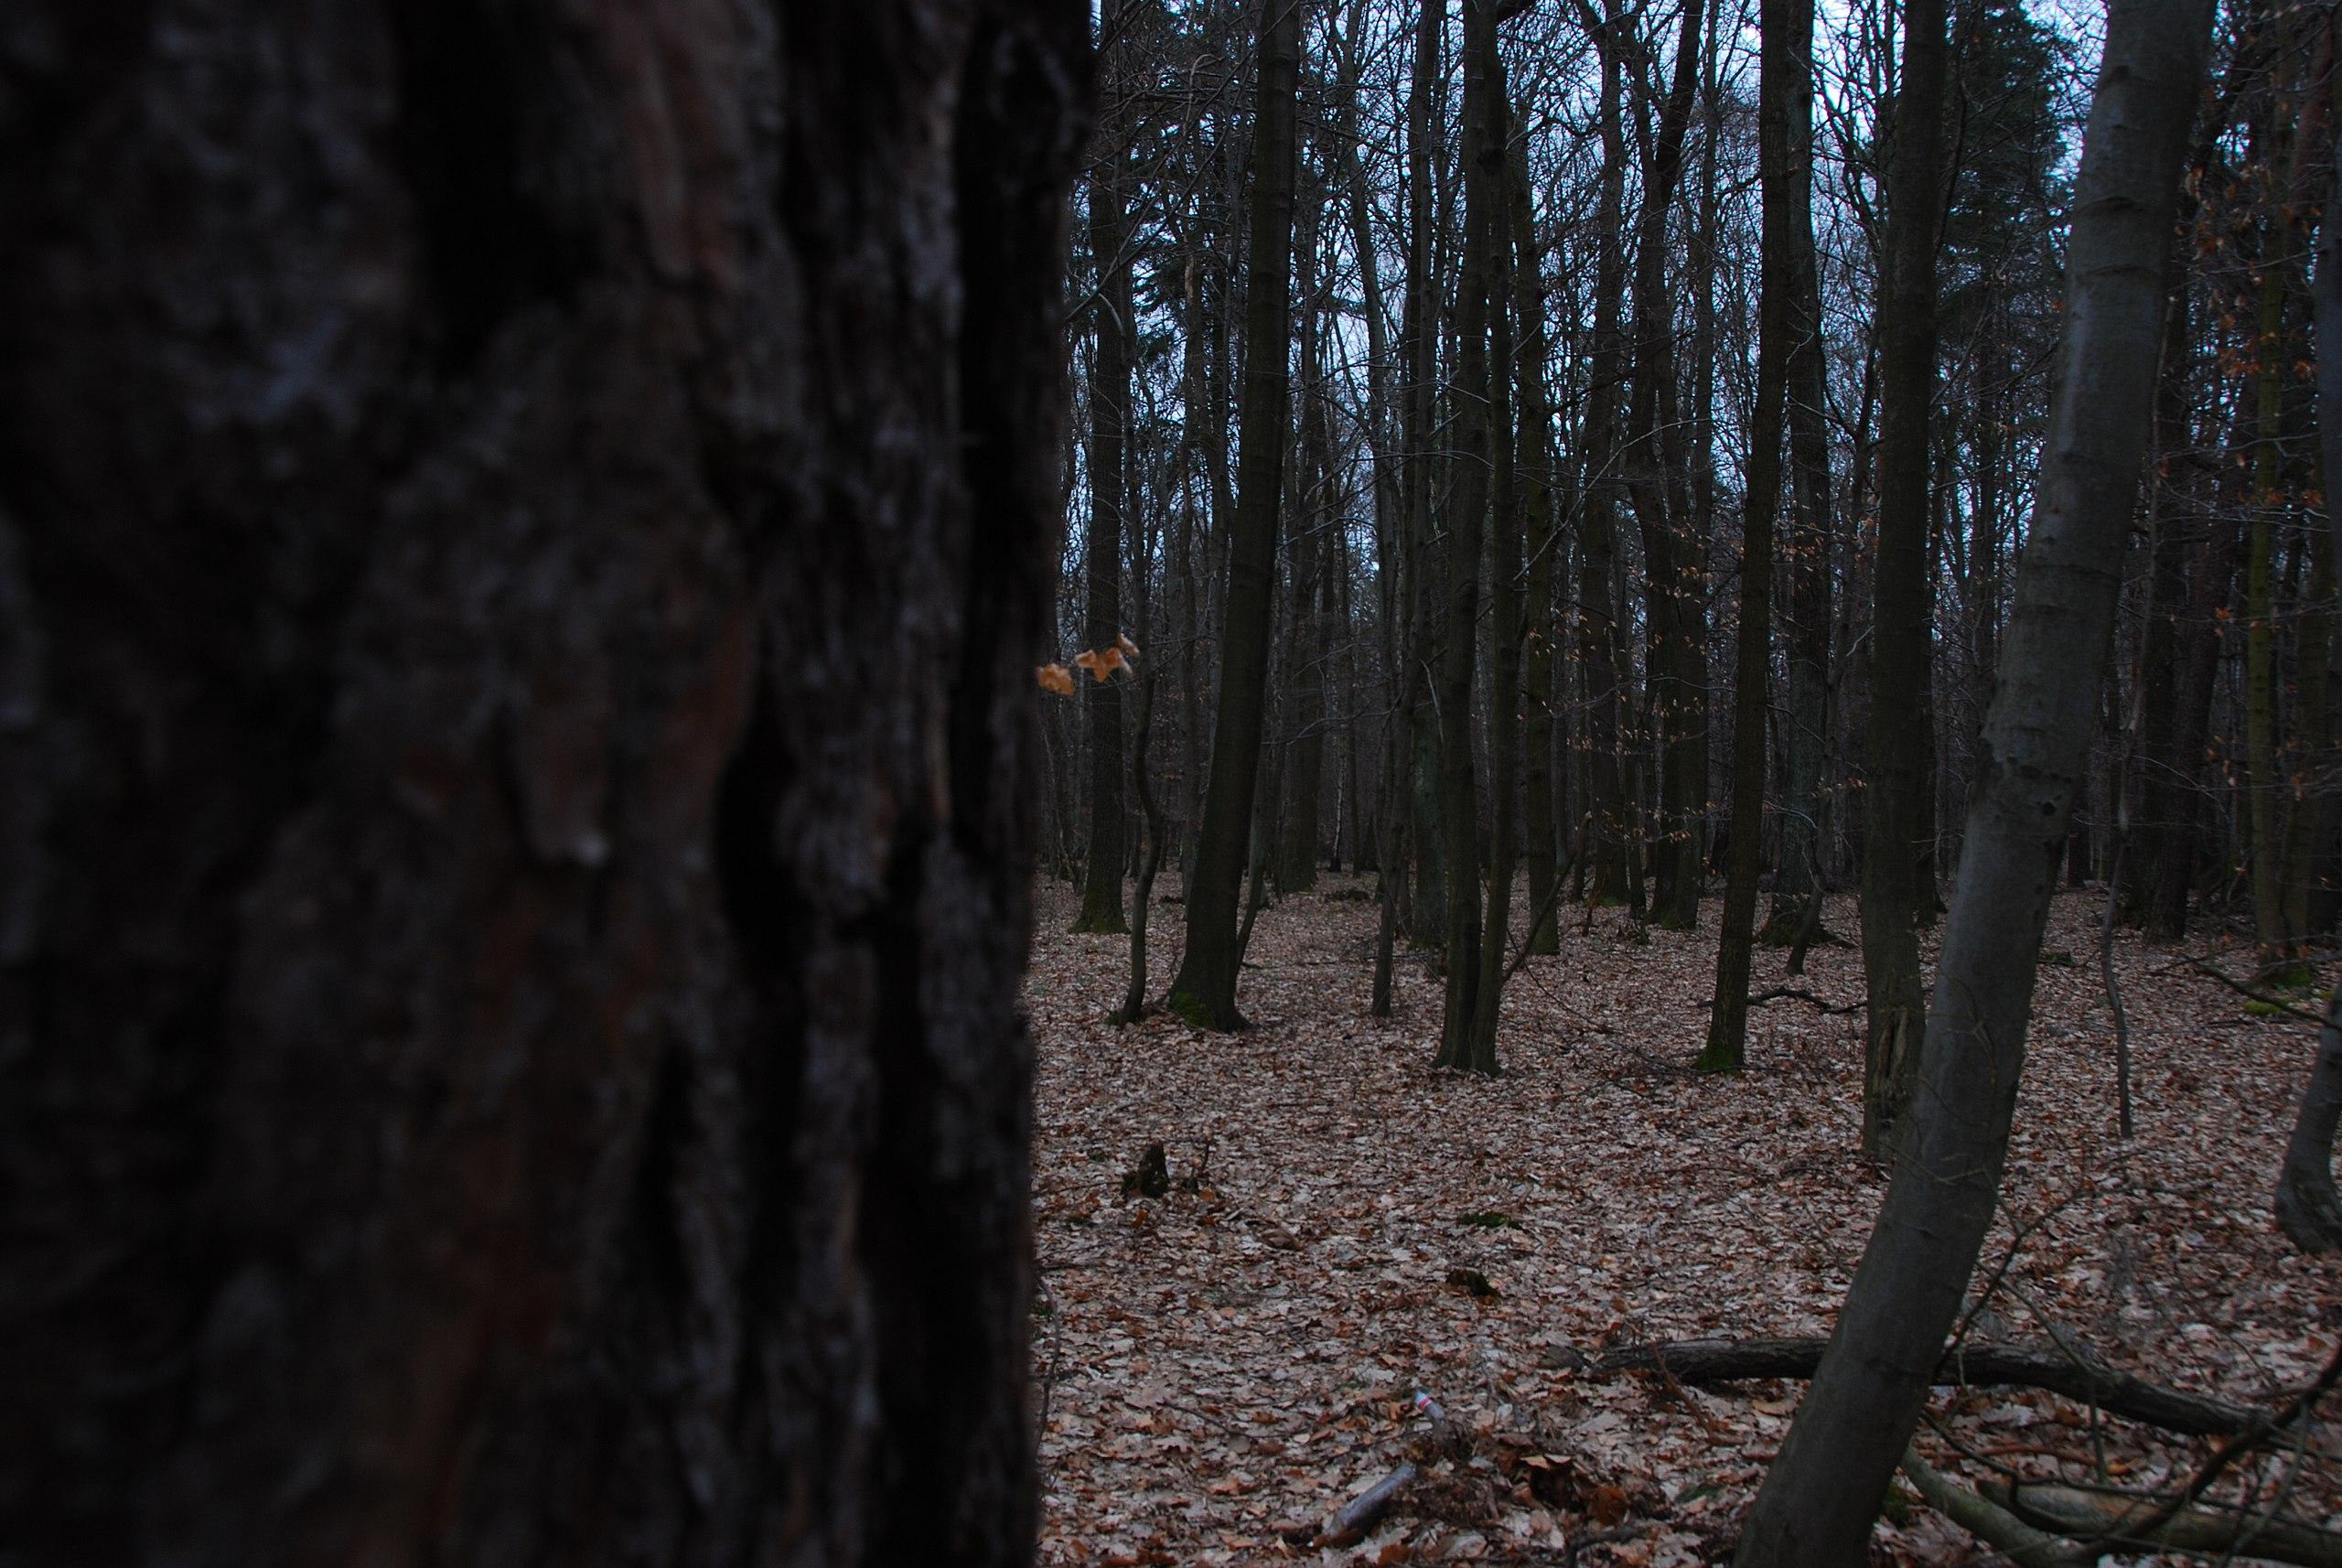 File:Dark Forest.jpg - Wikimedia Commons